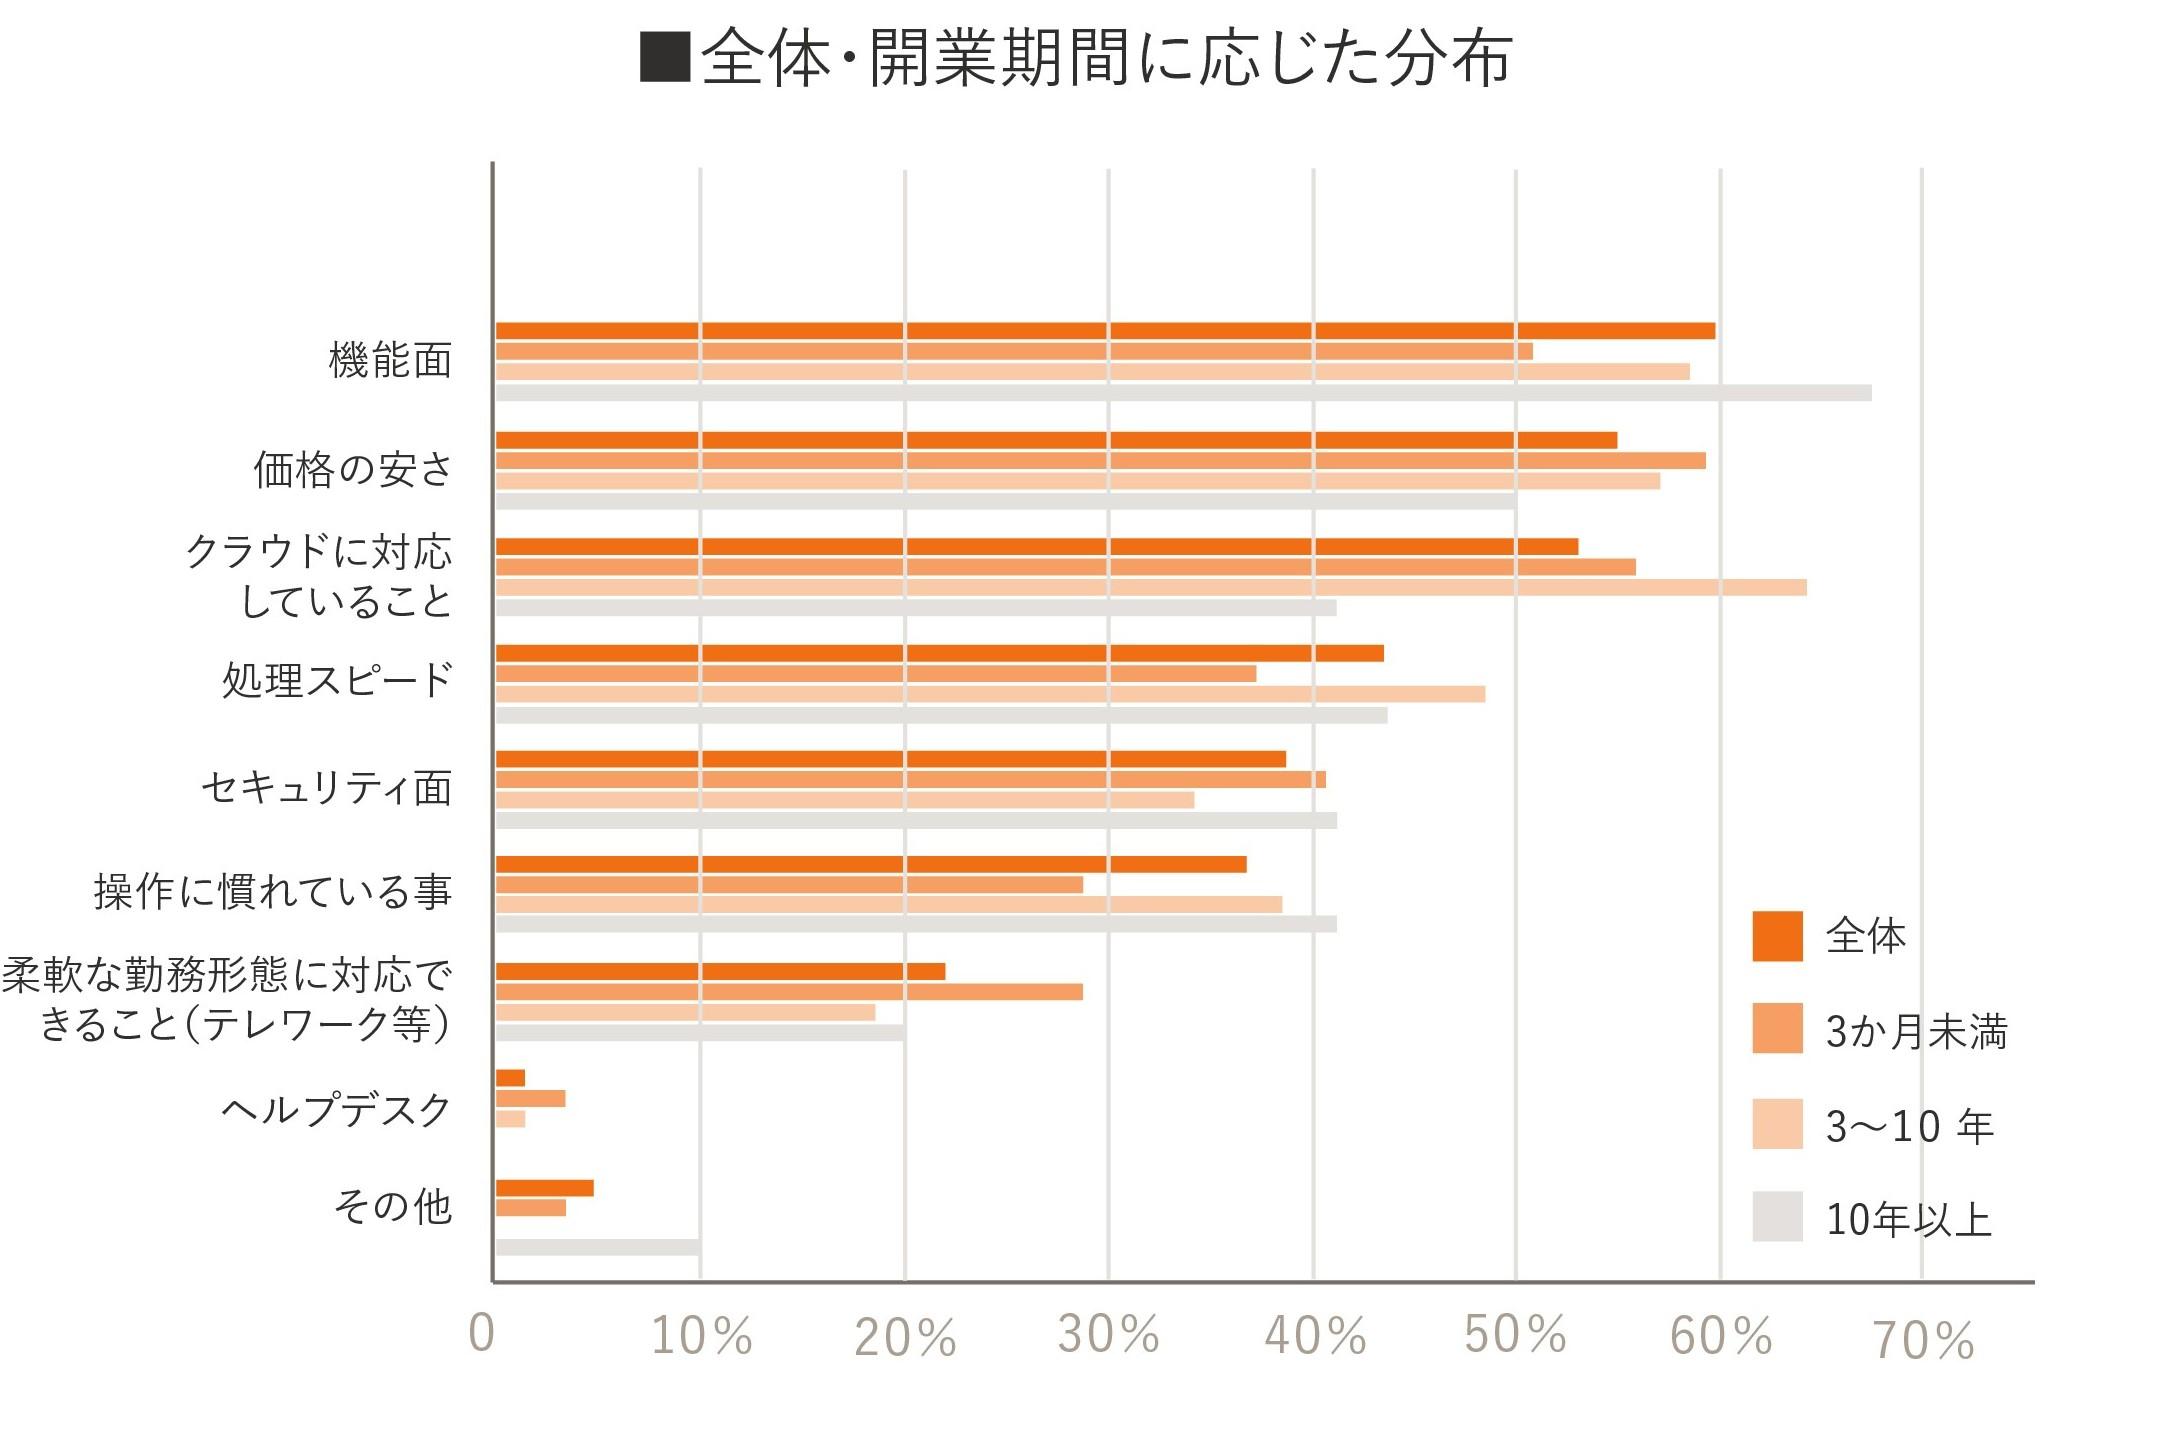 独立開業実態調査グラフ17